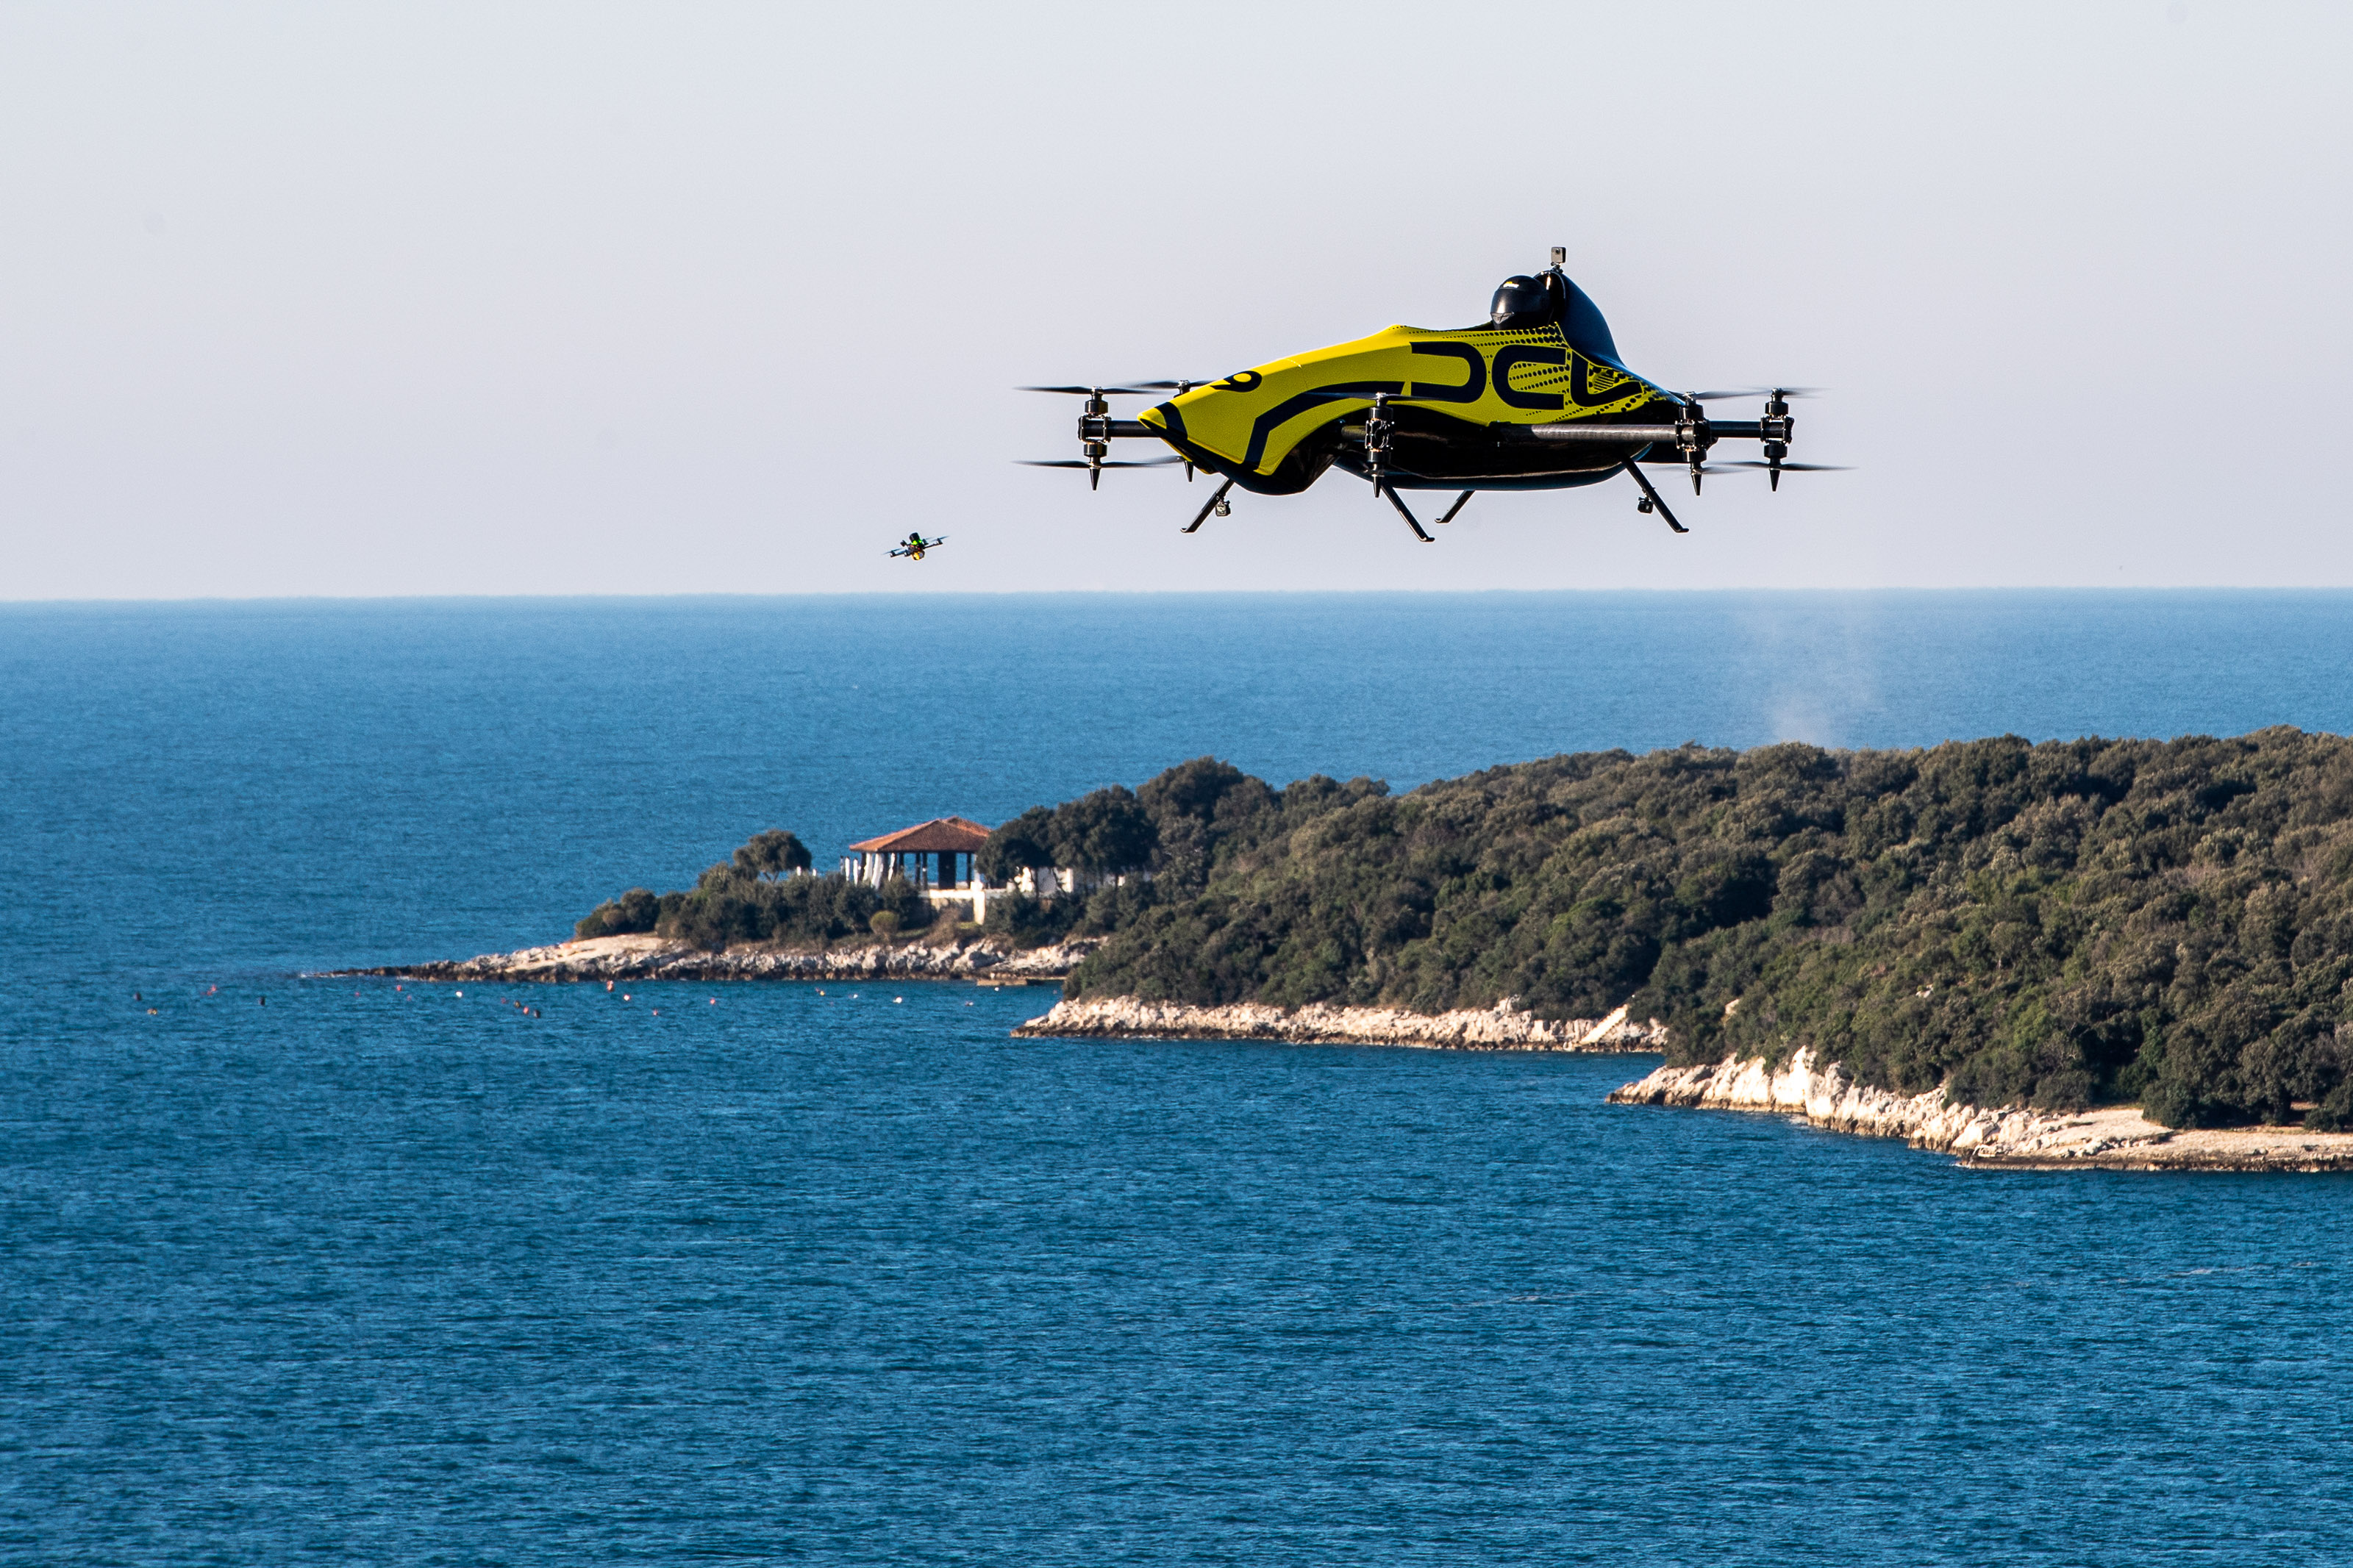 Анонсирована коллекционка DCL - The Game за миллион евро с пилотируемым дроном